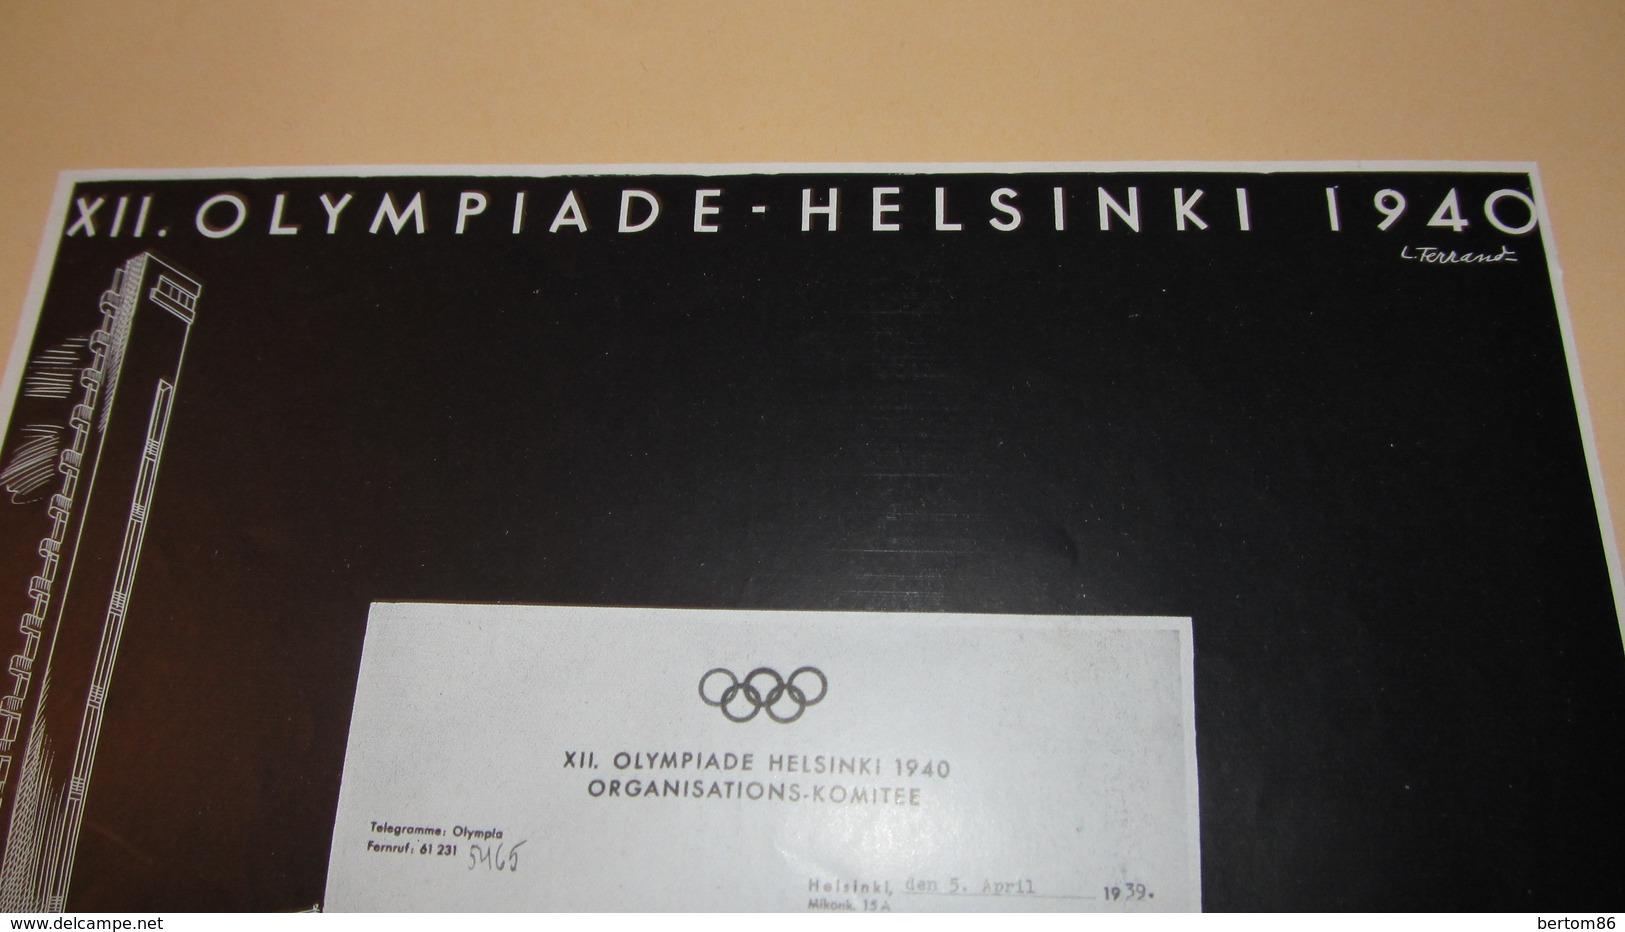 MONTRES - CHRONOMETRES LONGINES - XII. OLYMPIADE - HELSINKI 1940 -  PUBLICITE DE 1939 - Werbung